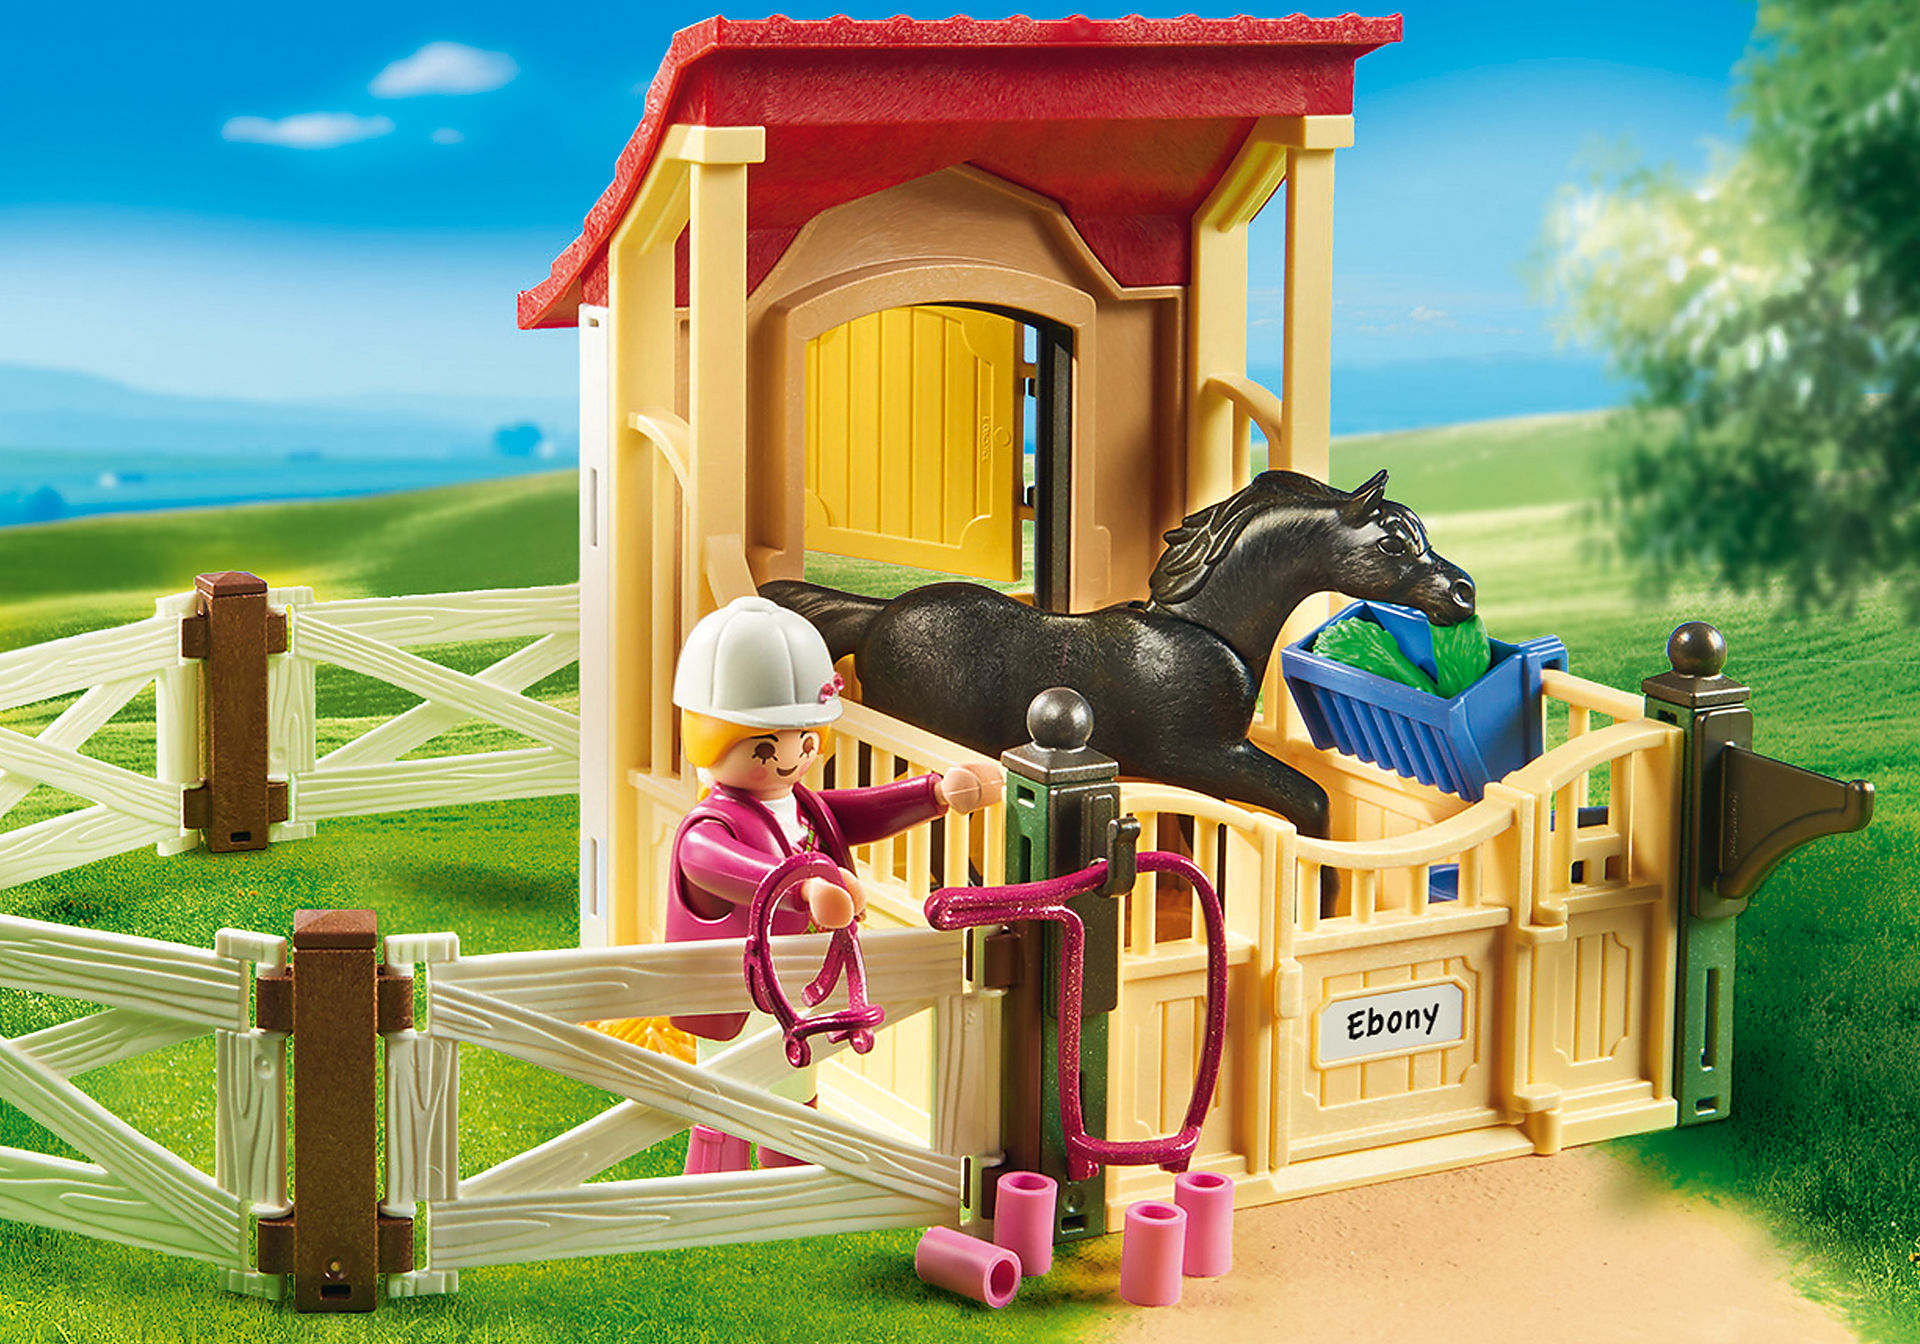 http://media.playmobil.com/i/playmobil/6934_product_extra2/Arabier met paardenbox